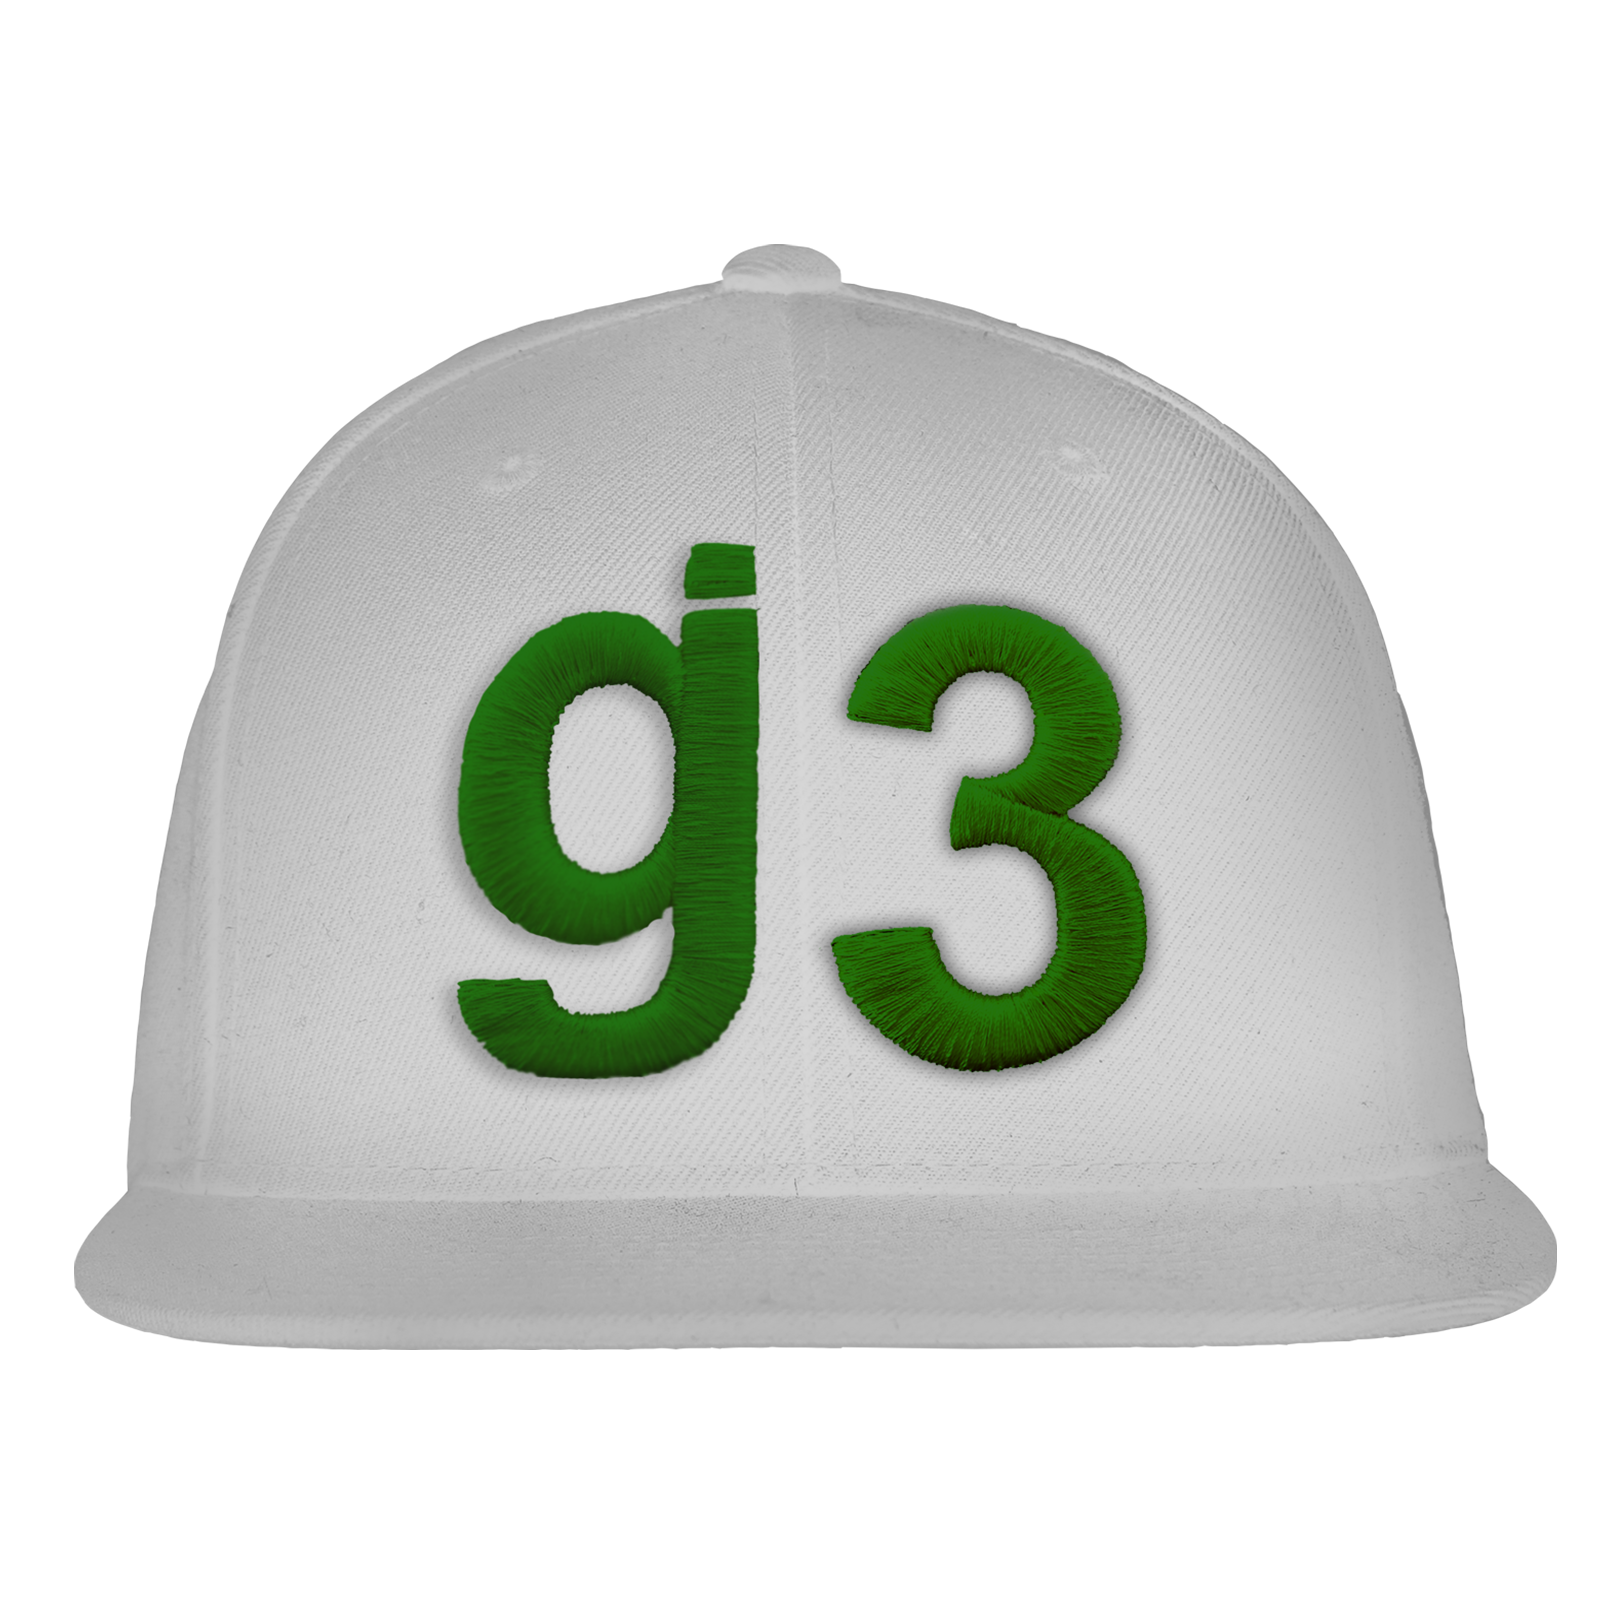 OCG G3 white Snapback